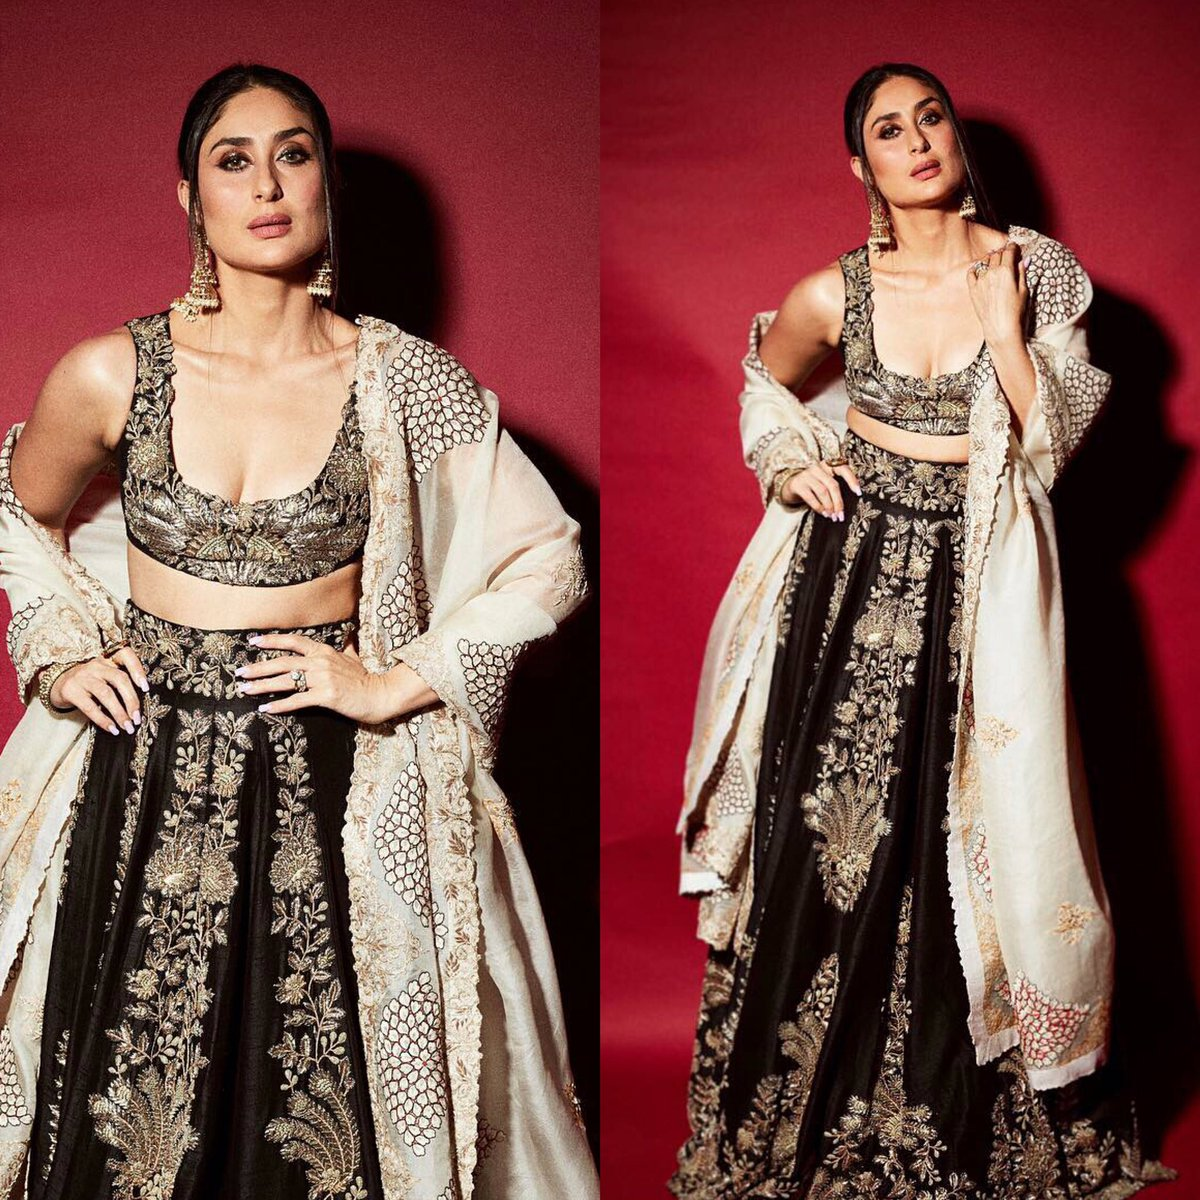 #KareenaKapoorKhan at #Shahrukhkhan 's Diwali Bash  Outfit: #anamikakhanna Jewelry: #sunitashekhawat  Makeup: #savleenmanchanda  Styled by: #mohitrai   #diwaliparty #Kareenakapoor #SRK #diwalibash #fashion #bollywood #bollywoodstyle